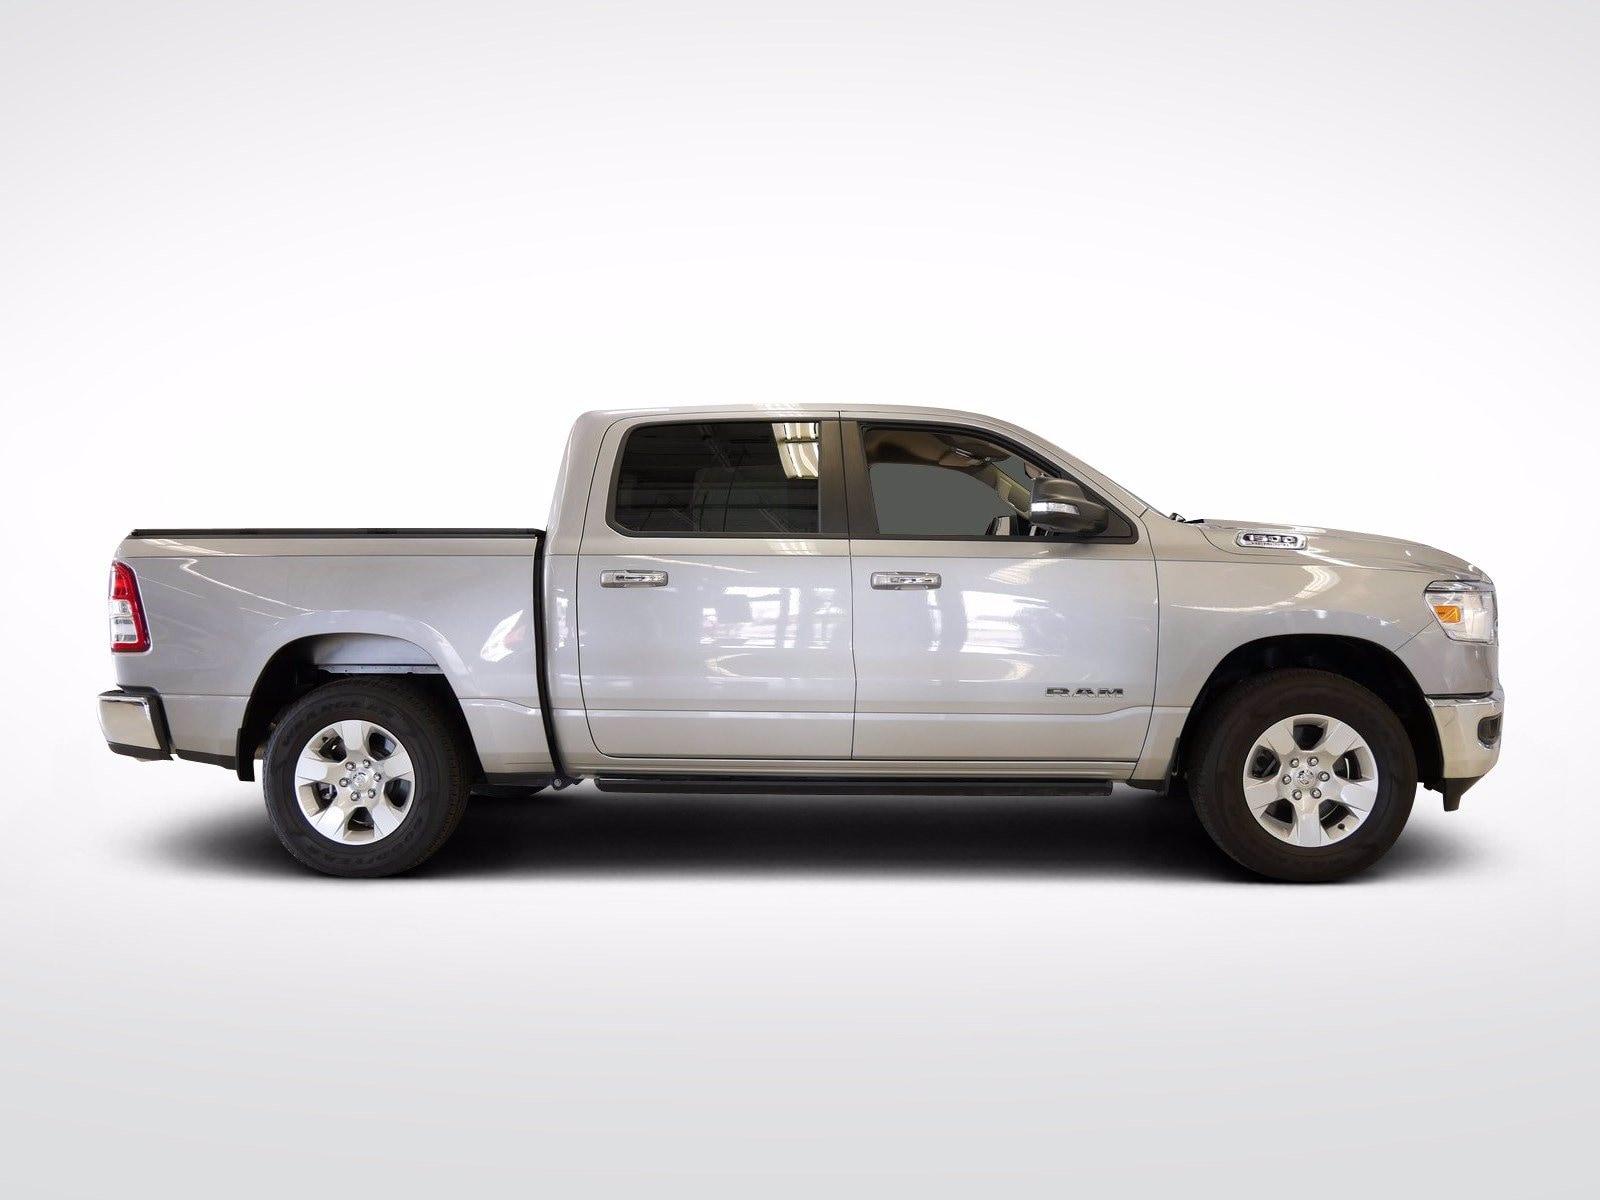 Used 2019 RAM Ram 1500 Pickup Big Horn/Lone Star with VIN 1C6SRFFTXKN624324 for sale in Willmar, Minnesota